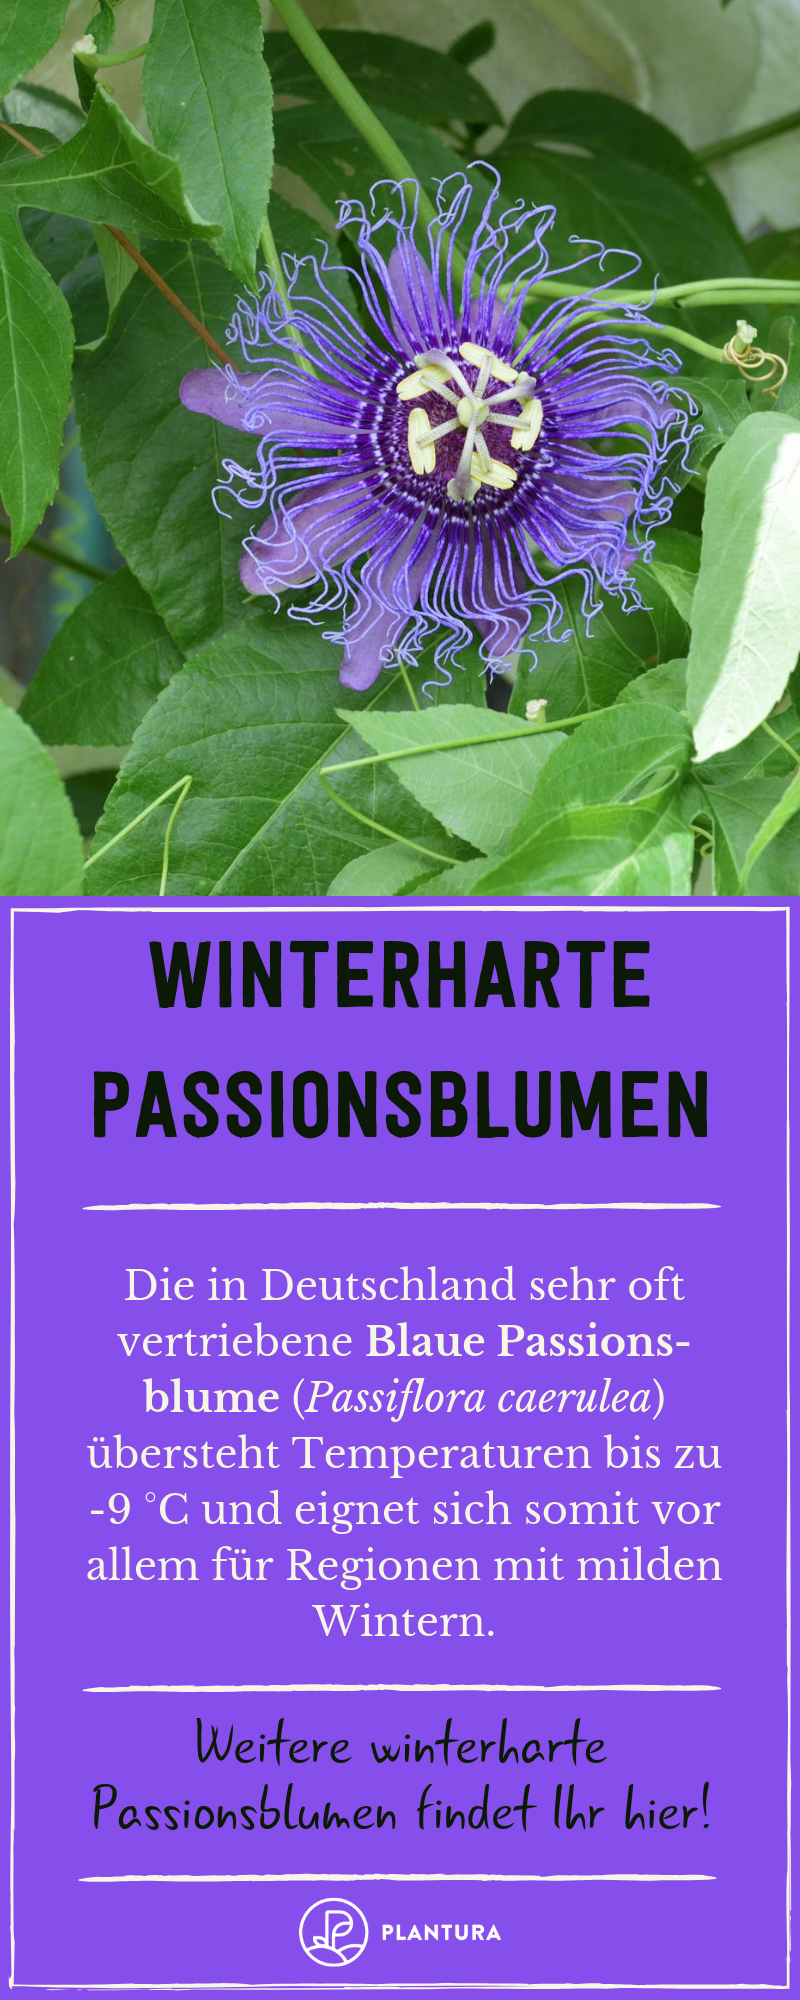 Winterharte Passionsblumen-Arten: Die 3 Kältetolerantesten - Plantura